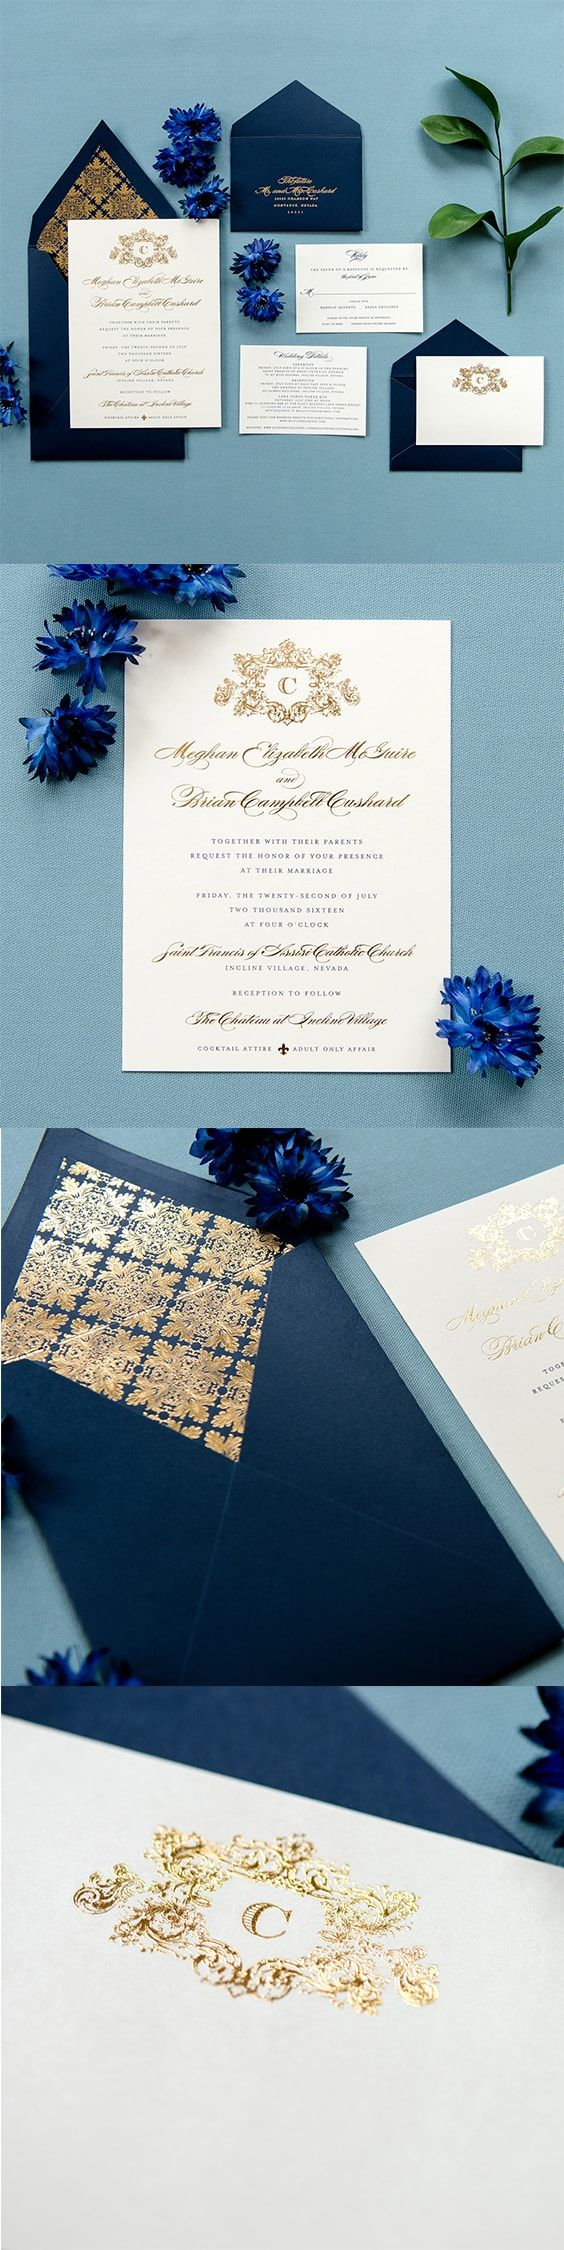 402 best Invitations I love images on Pinterest   Invitations ...